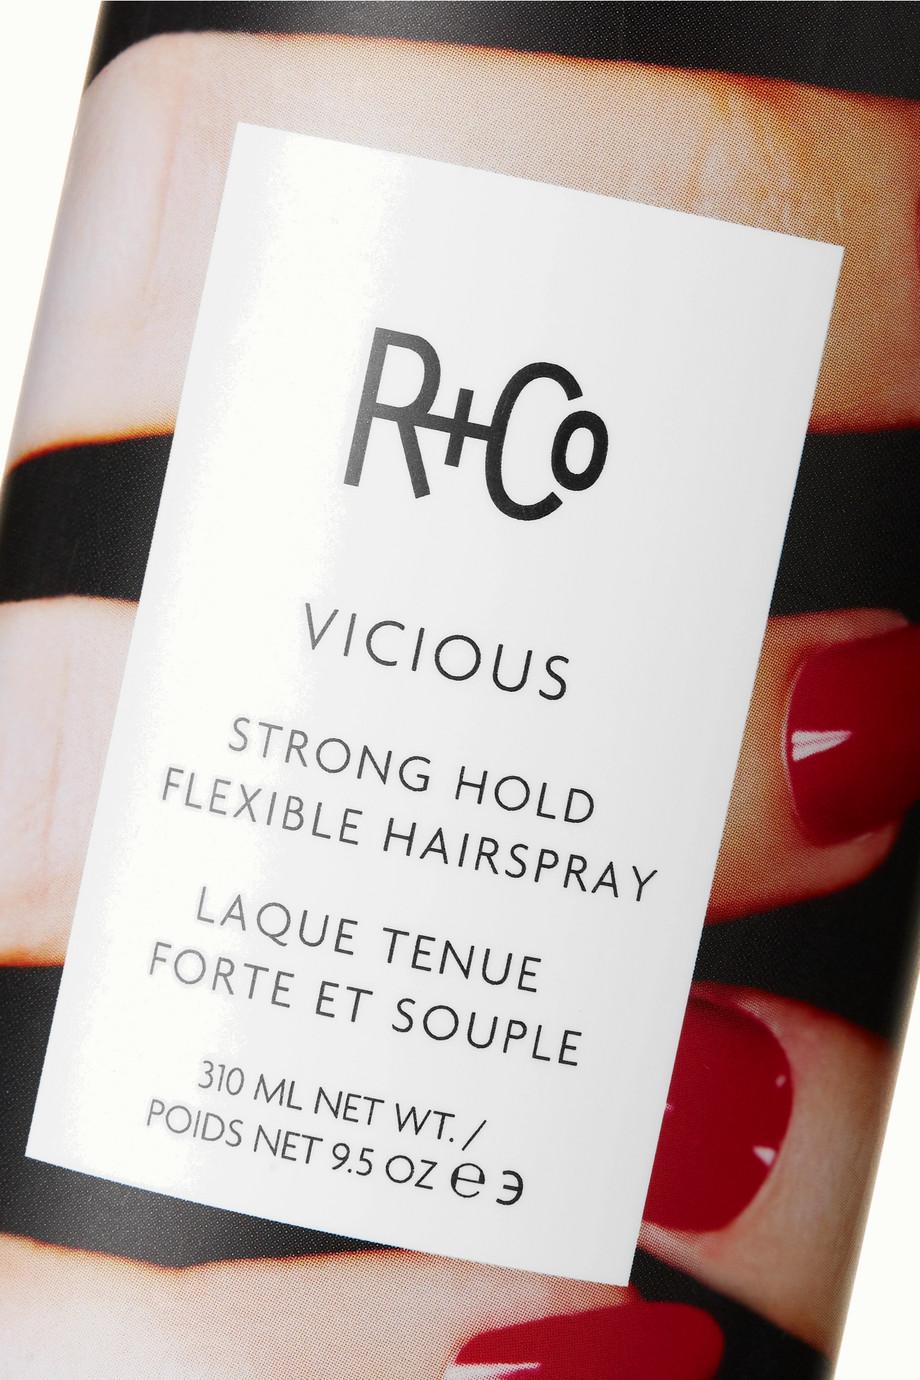 R+Co Vicious Strong Hold Flexible Hairspray, 310ml